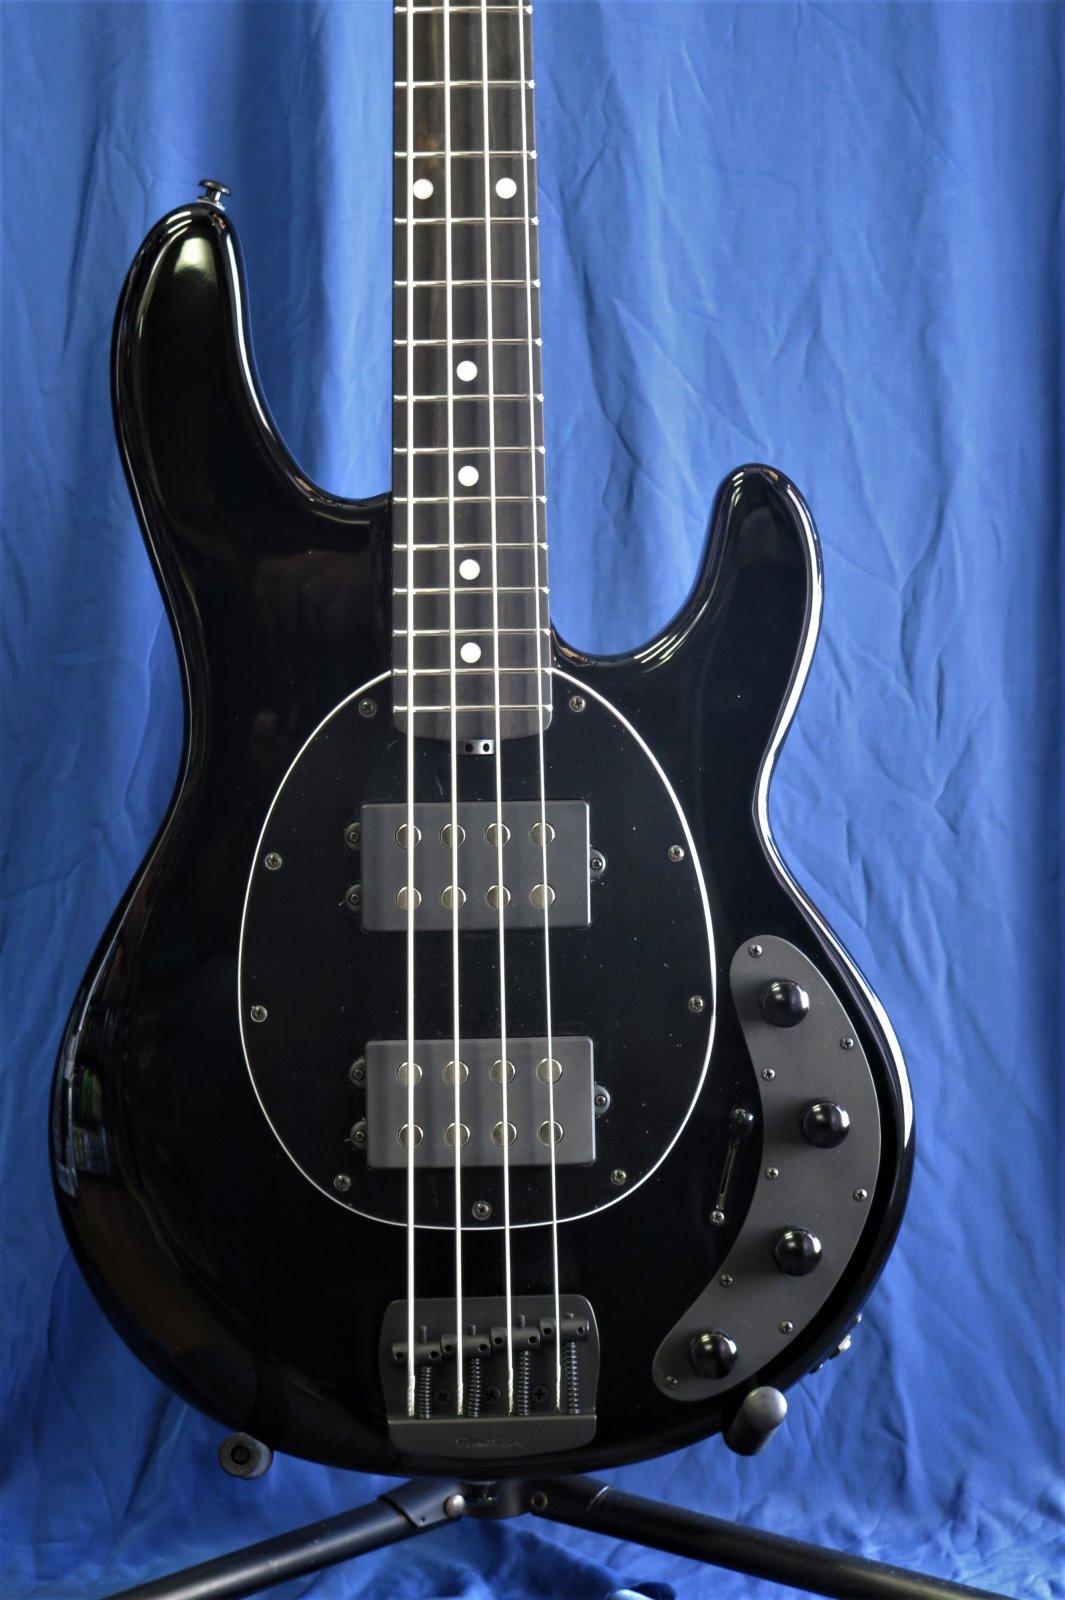 Ernie Ball Music Man StingRay HH Special - Black